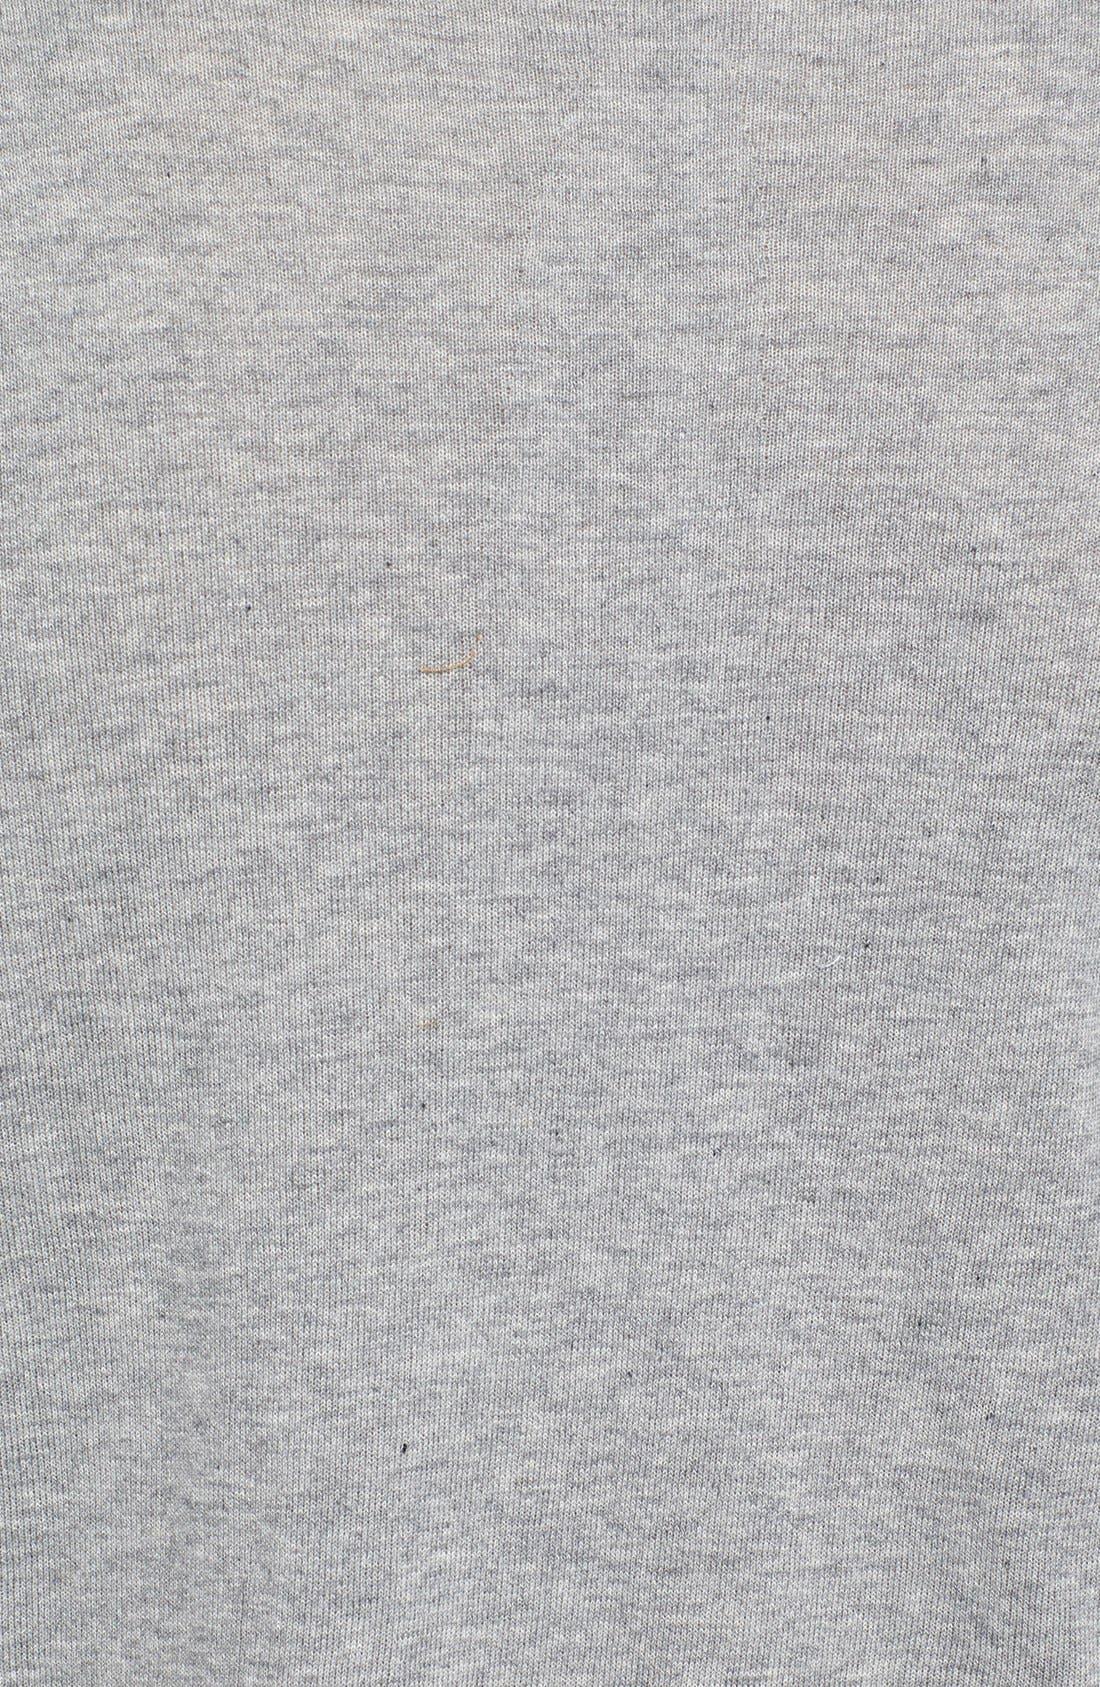 Alternate Image 3  - BOSS HUGO BOSS 'Perinus' Crewneck Sweater